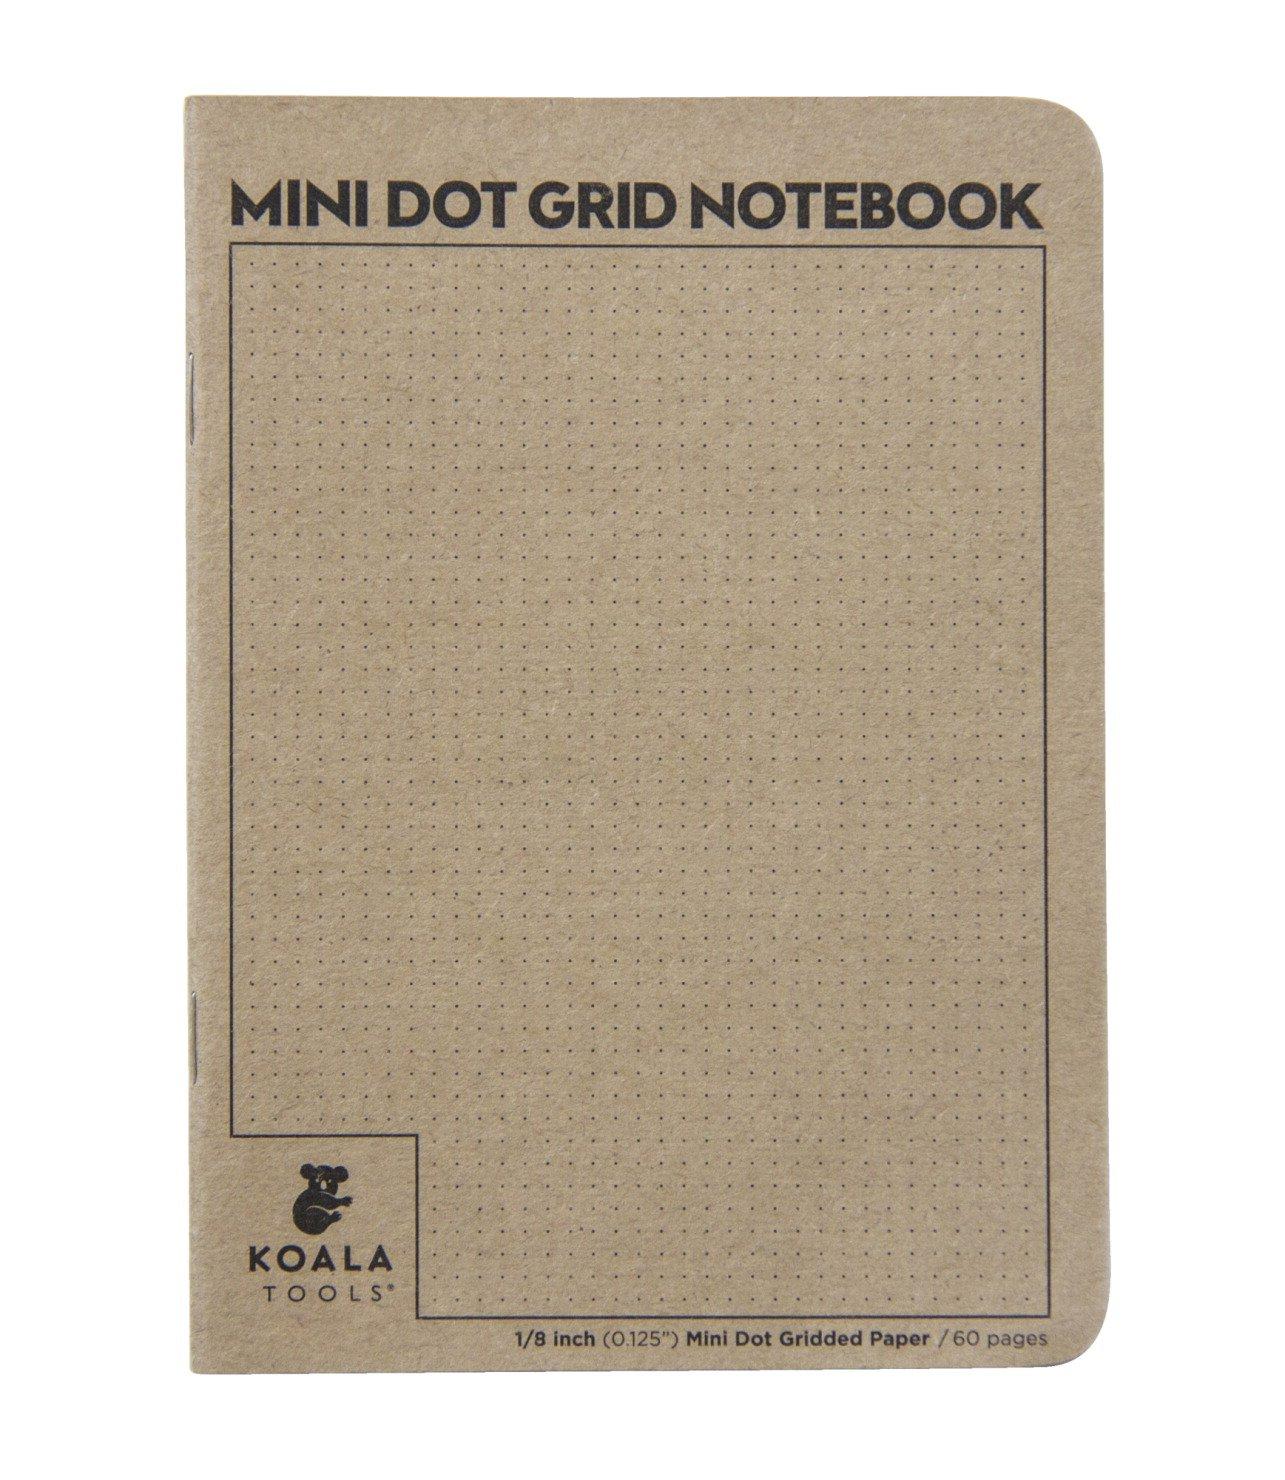 Koala Tools Mini Dot-Grid Notebook, 5 x 7 Inches, 60 Sheets, Pack of 24